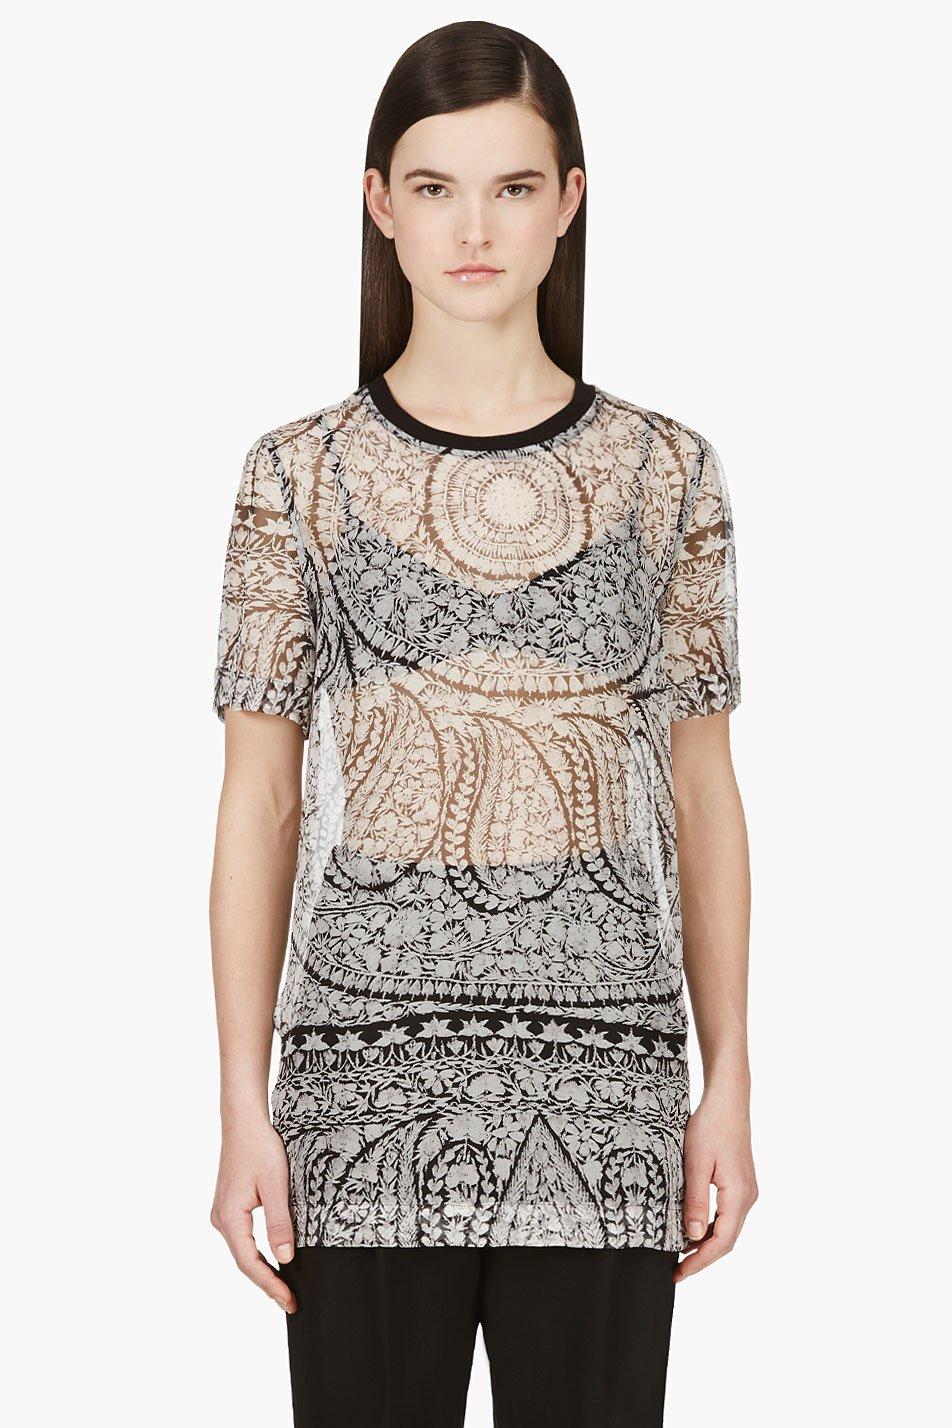 Giambattista valli white silk chiffon embroidery print t_shift